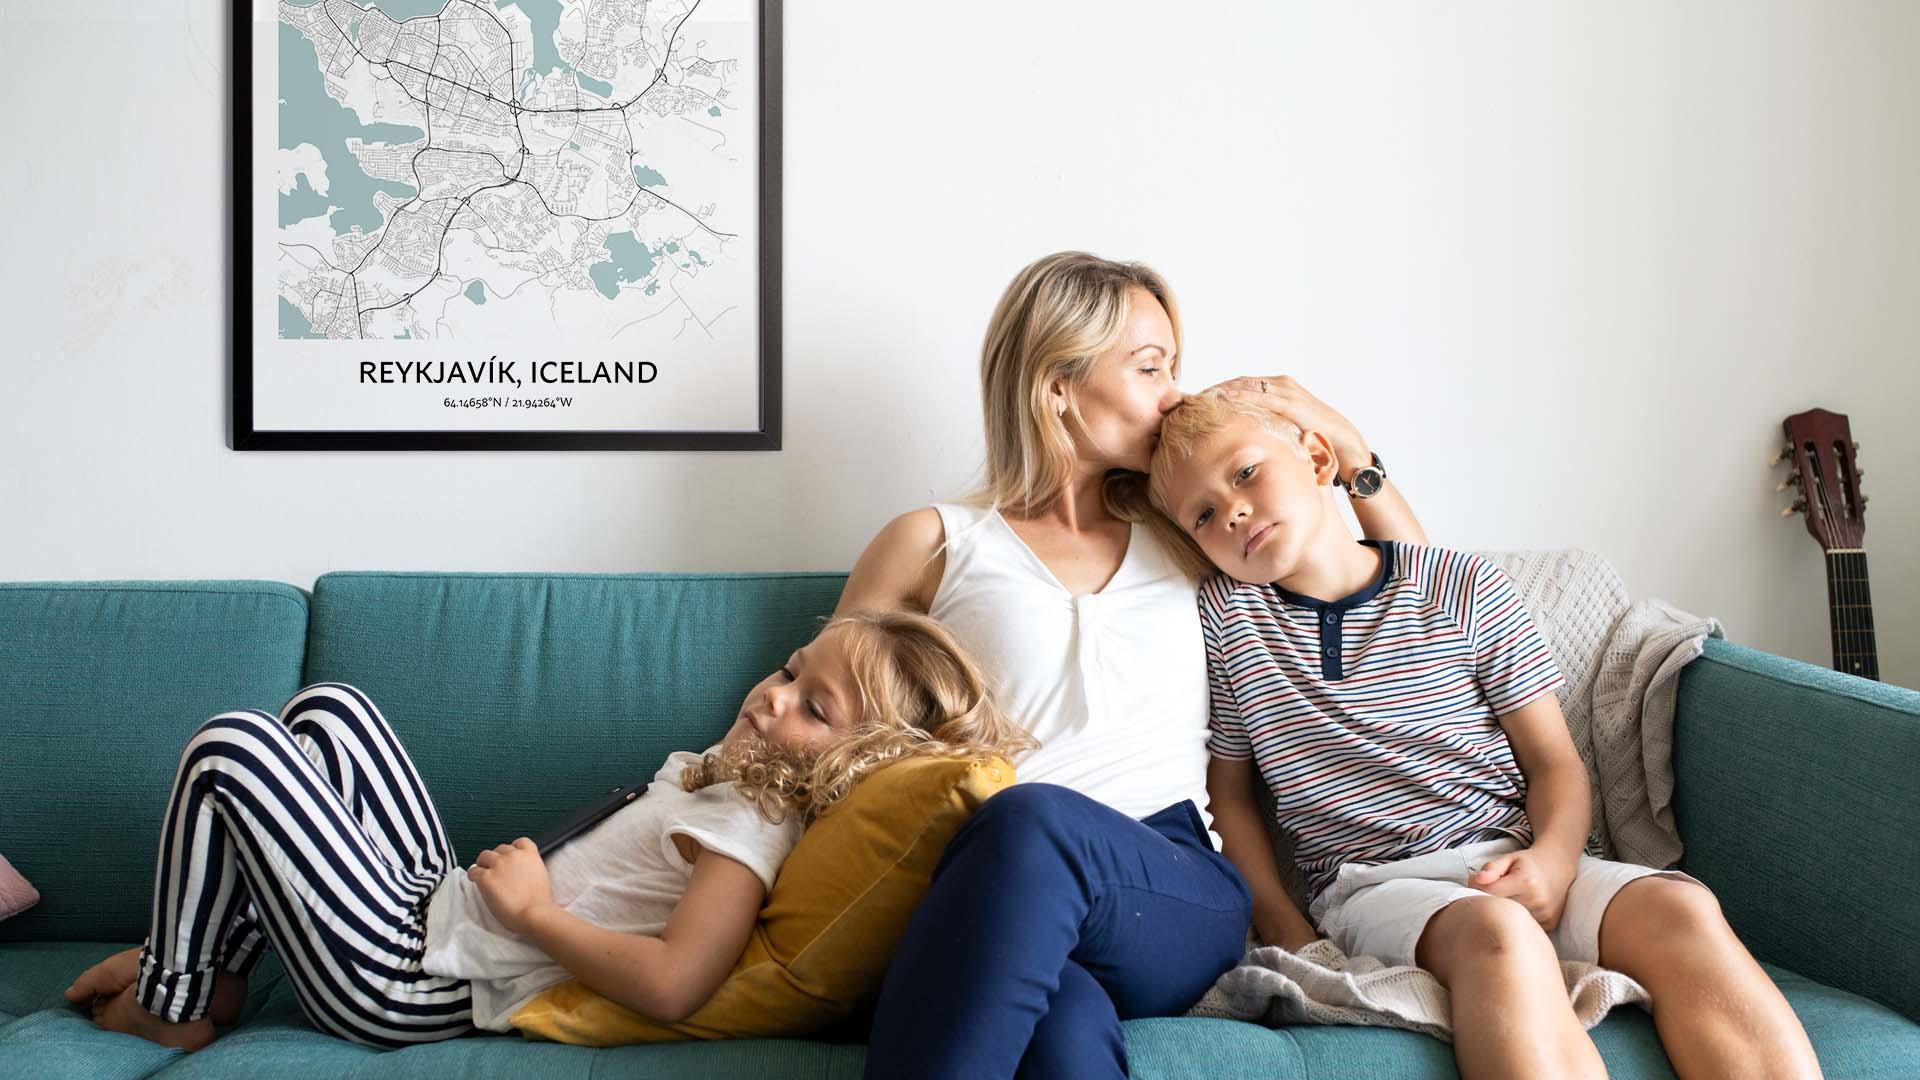 Reykjavik map poster